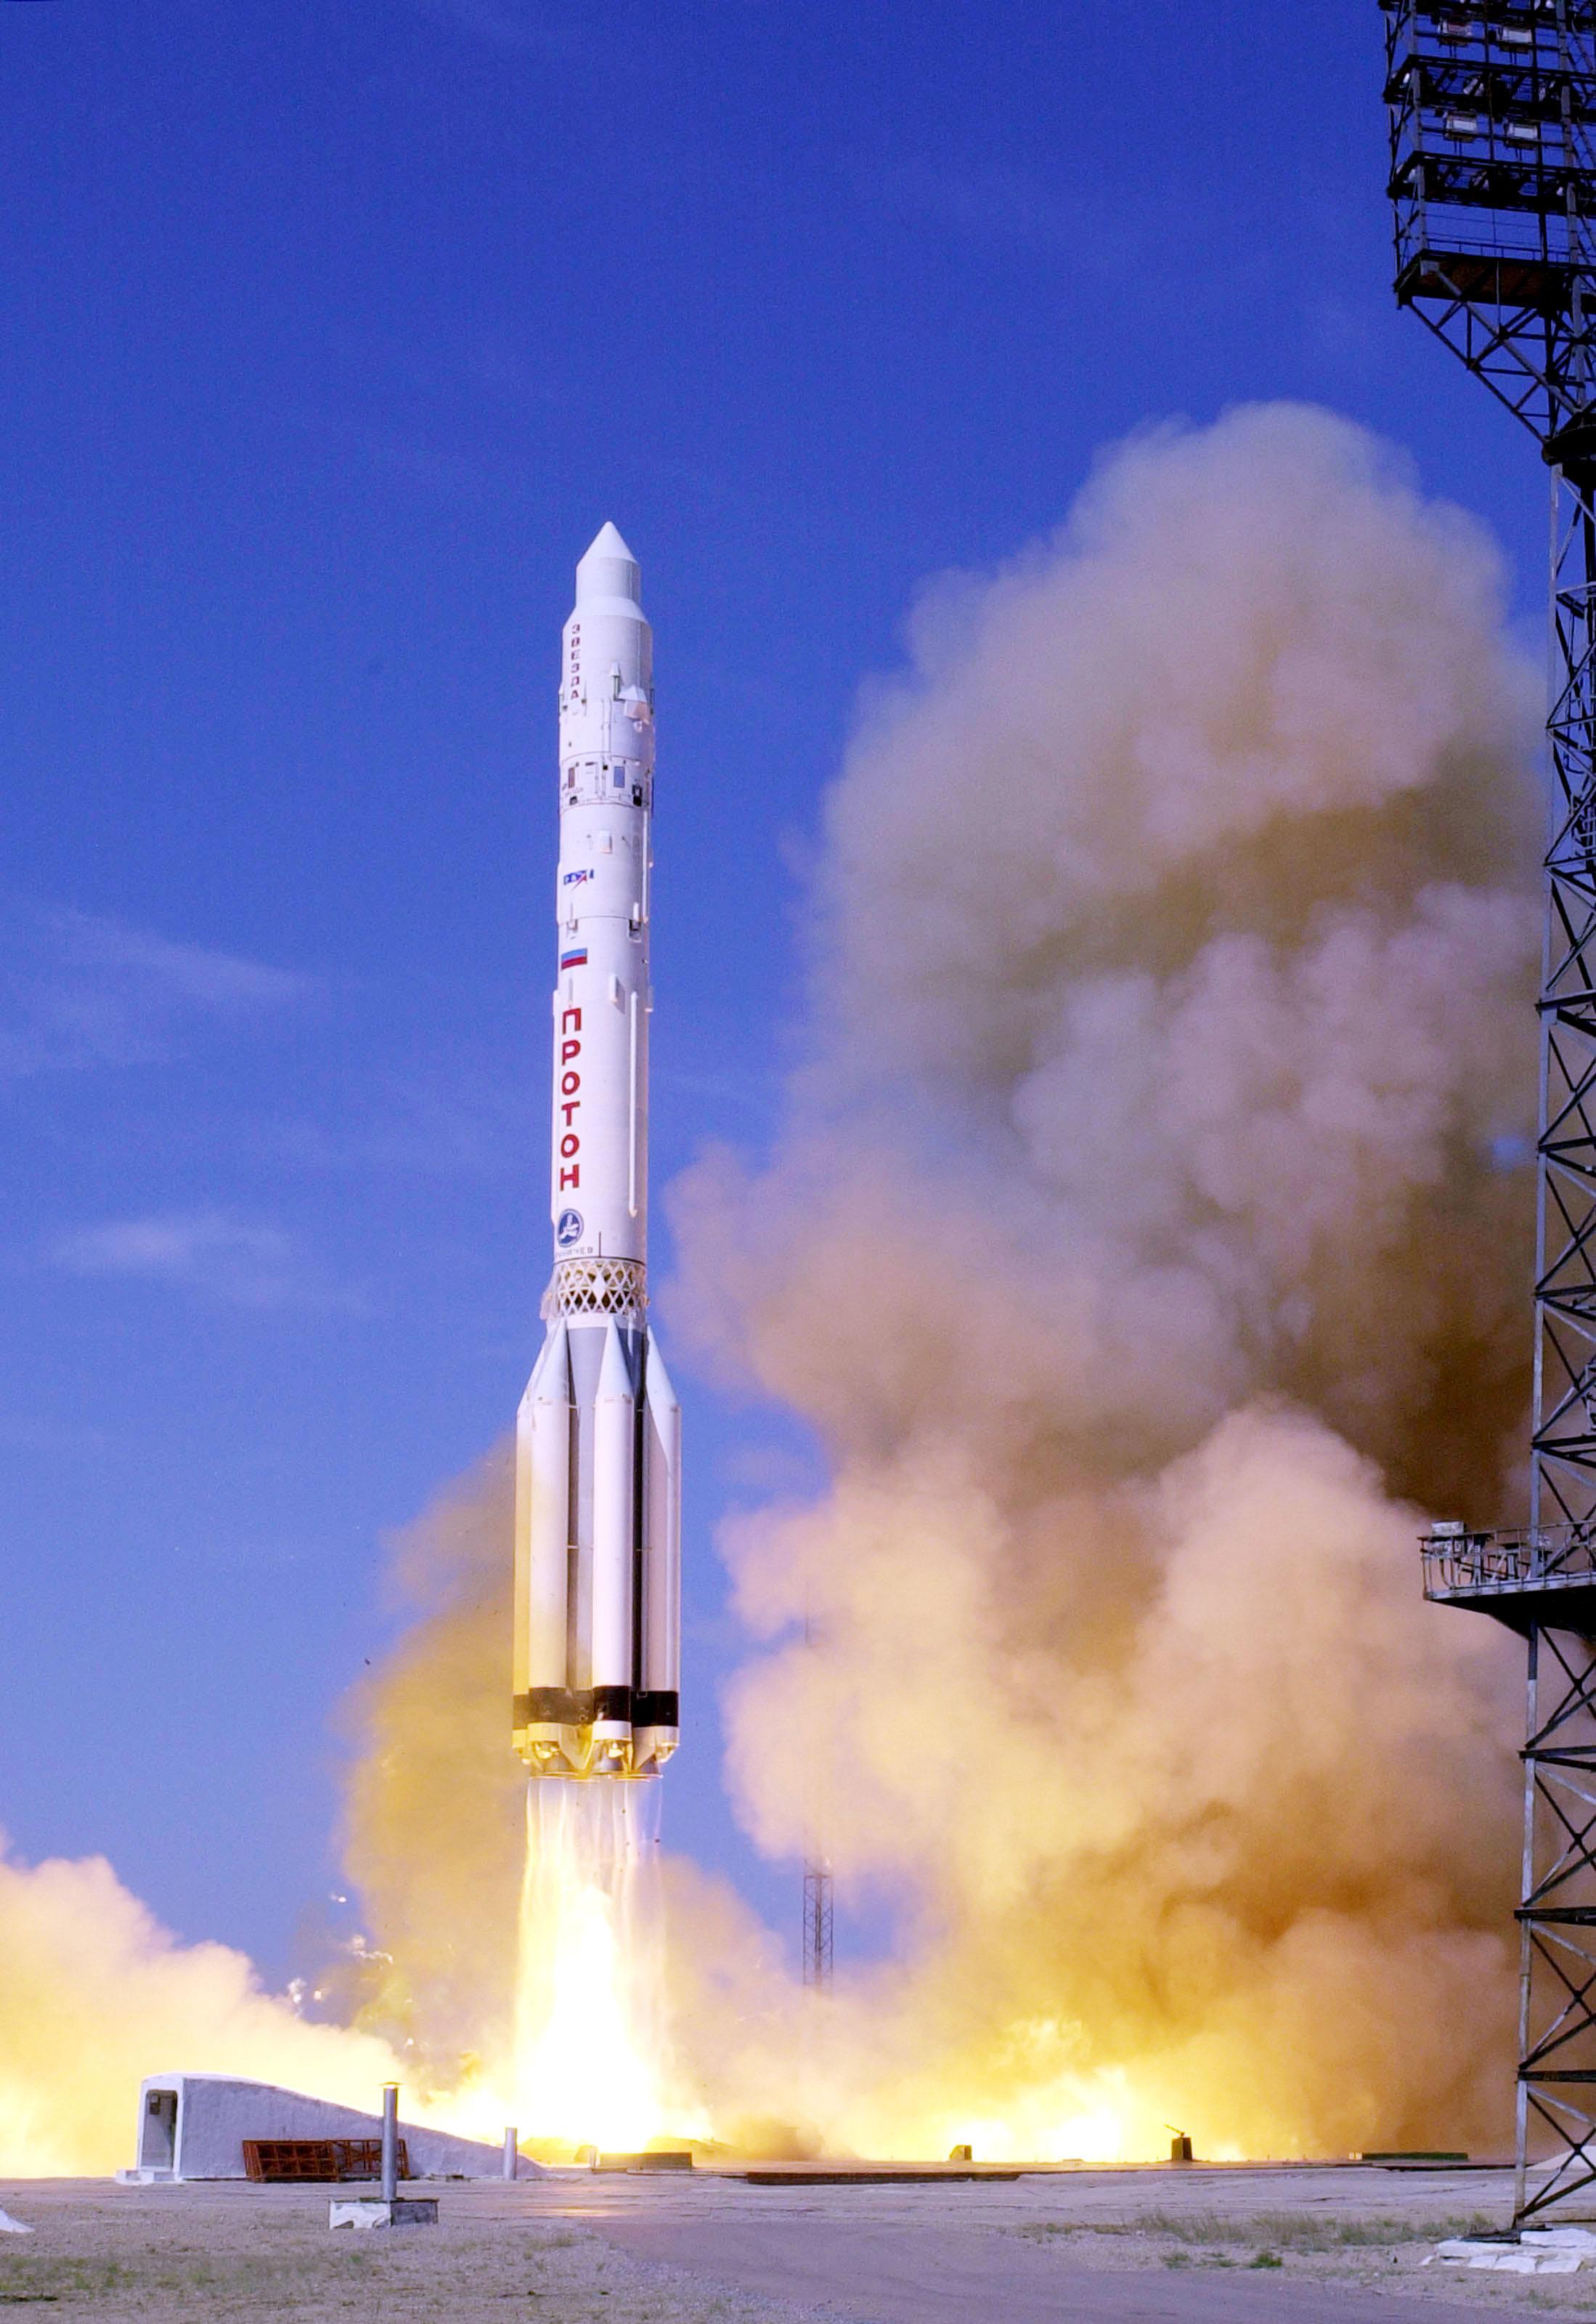 Nave Espacial Wikipedia La Enciclopedia Libre